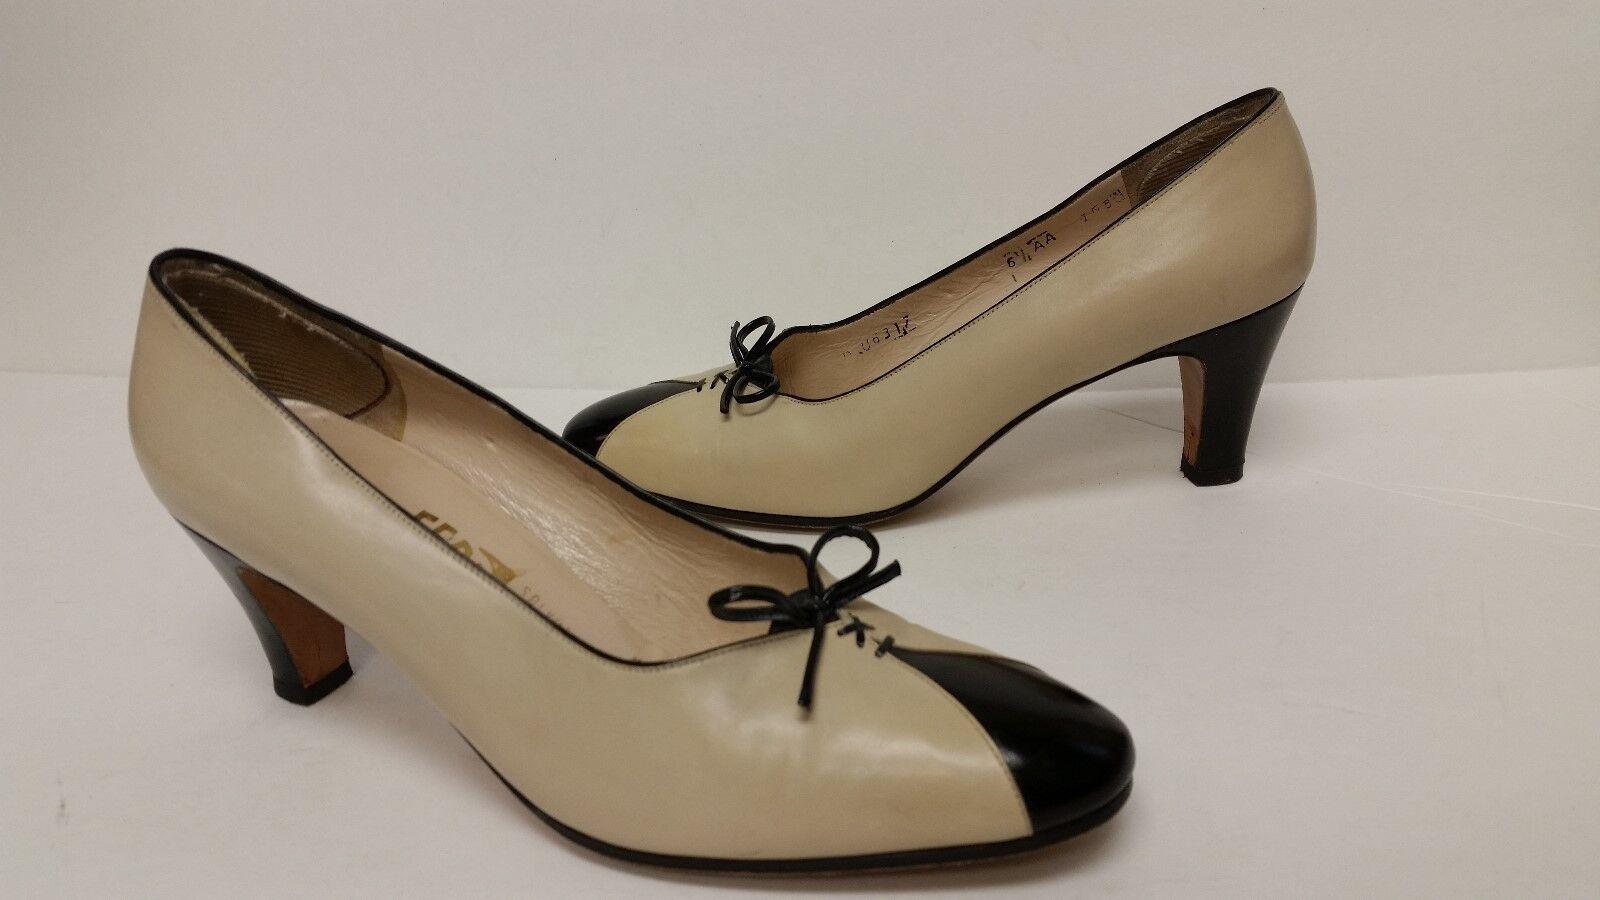 Salvatore Ferragamo Femme Noir & Blanc cassé 2 1 2  Chaussures à talon 6.5 AA Nice